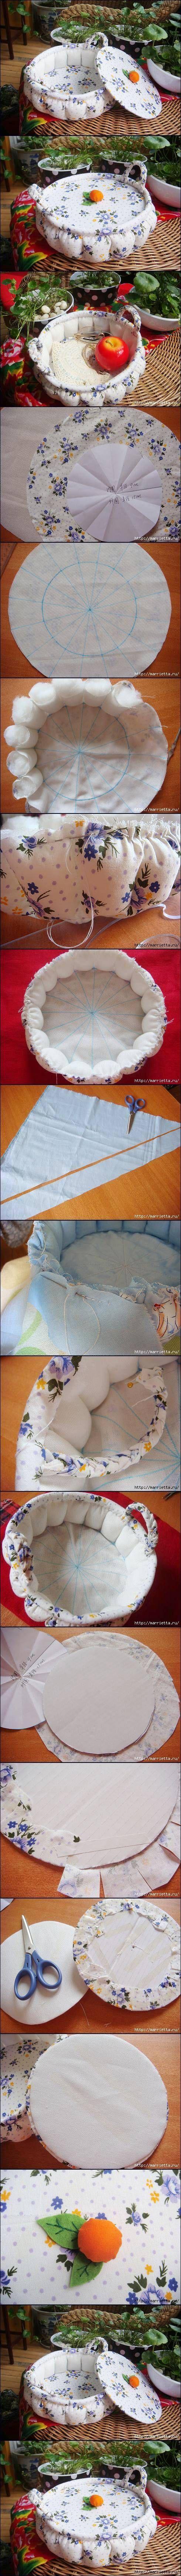 DIY lágy szövet kézimunka Basket DIY projektek |  UsefulDIY.com